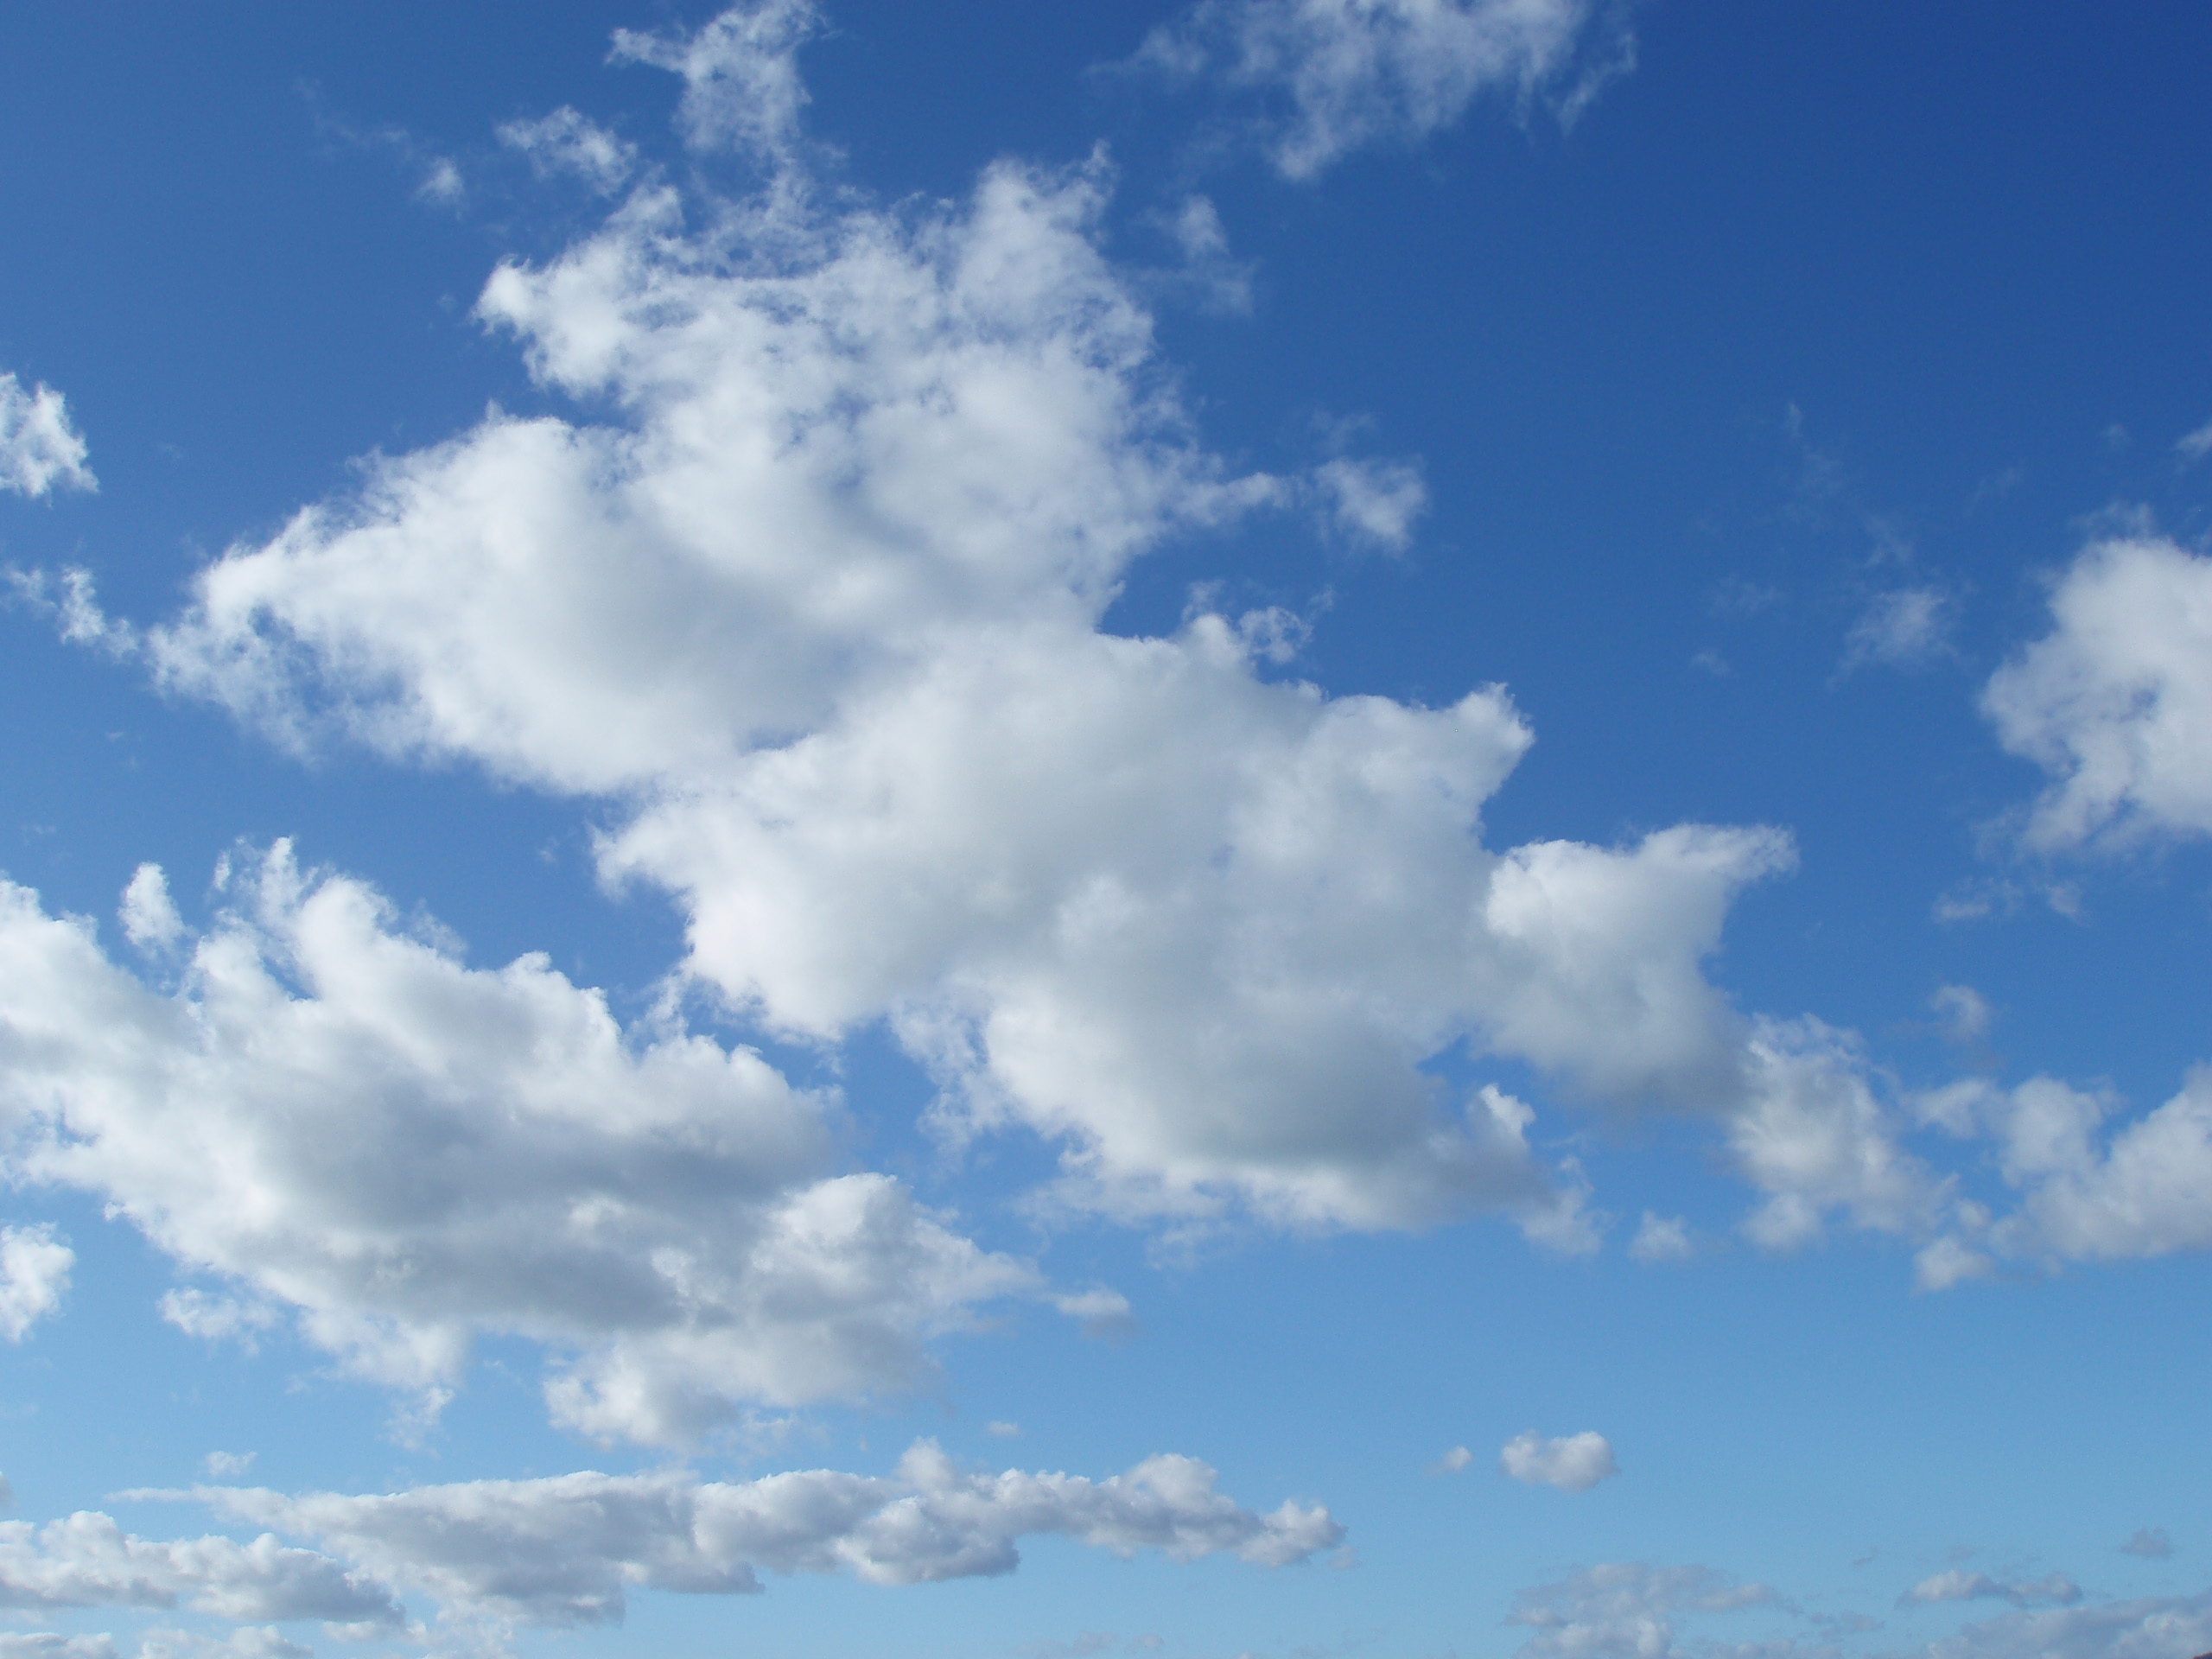 floor clouds sunny sky 1920x 1080 wallpaper art hd wallpaper bokeh 2560x1920